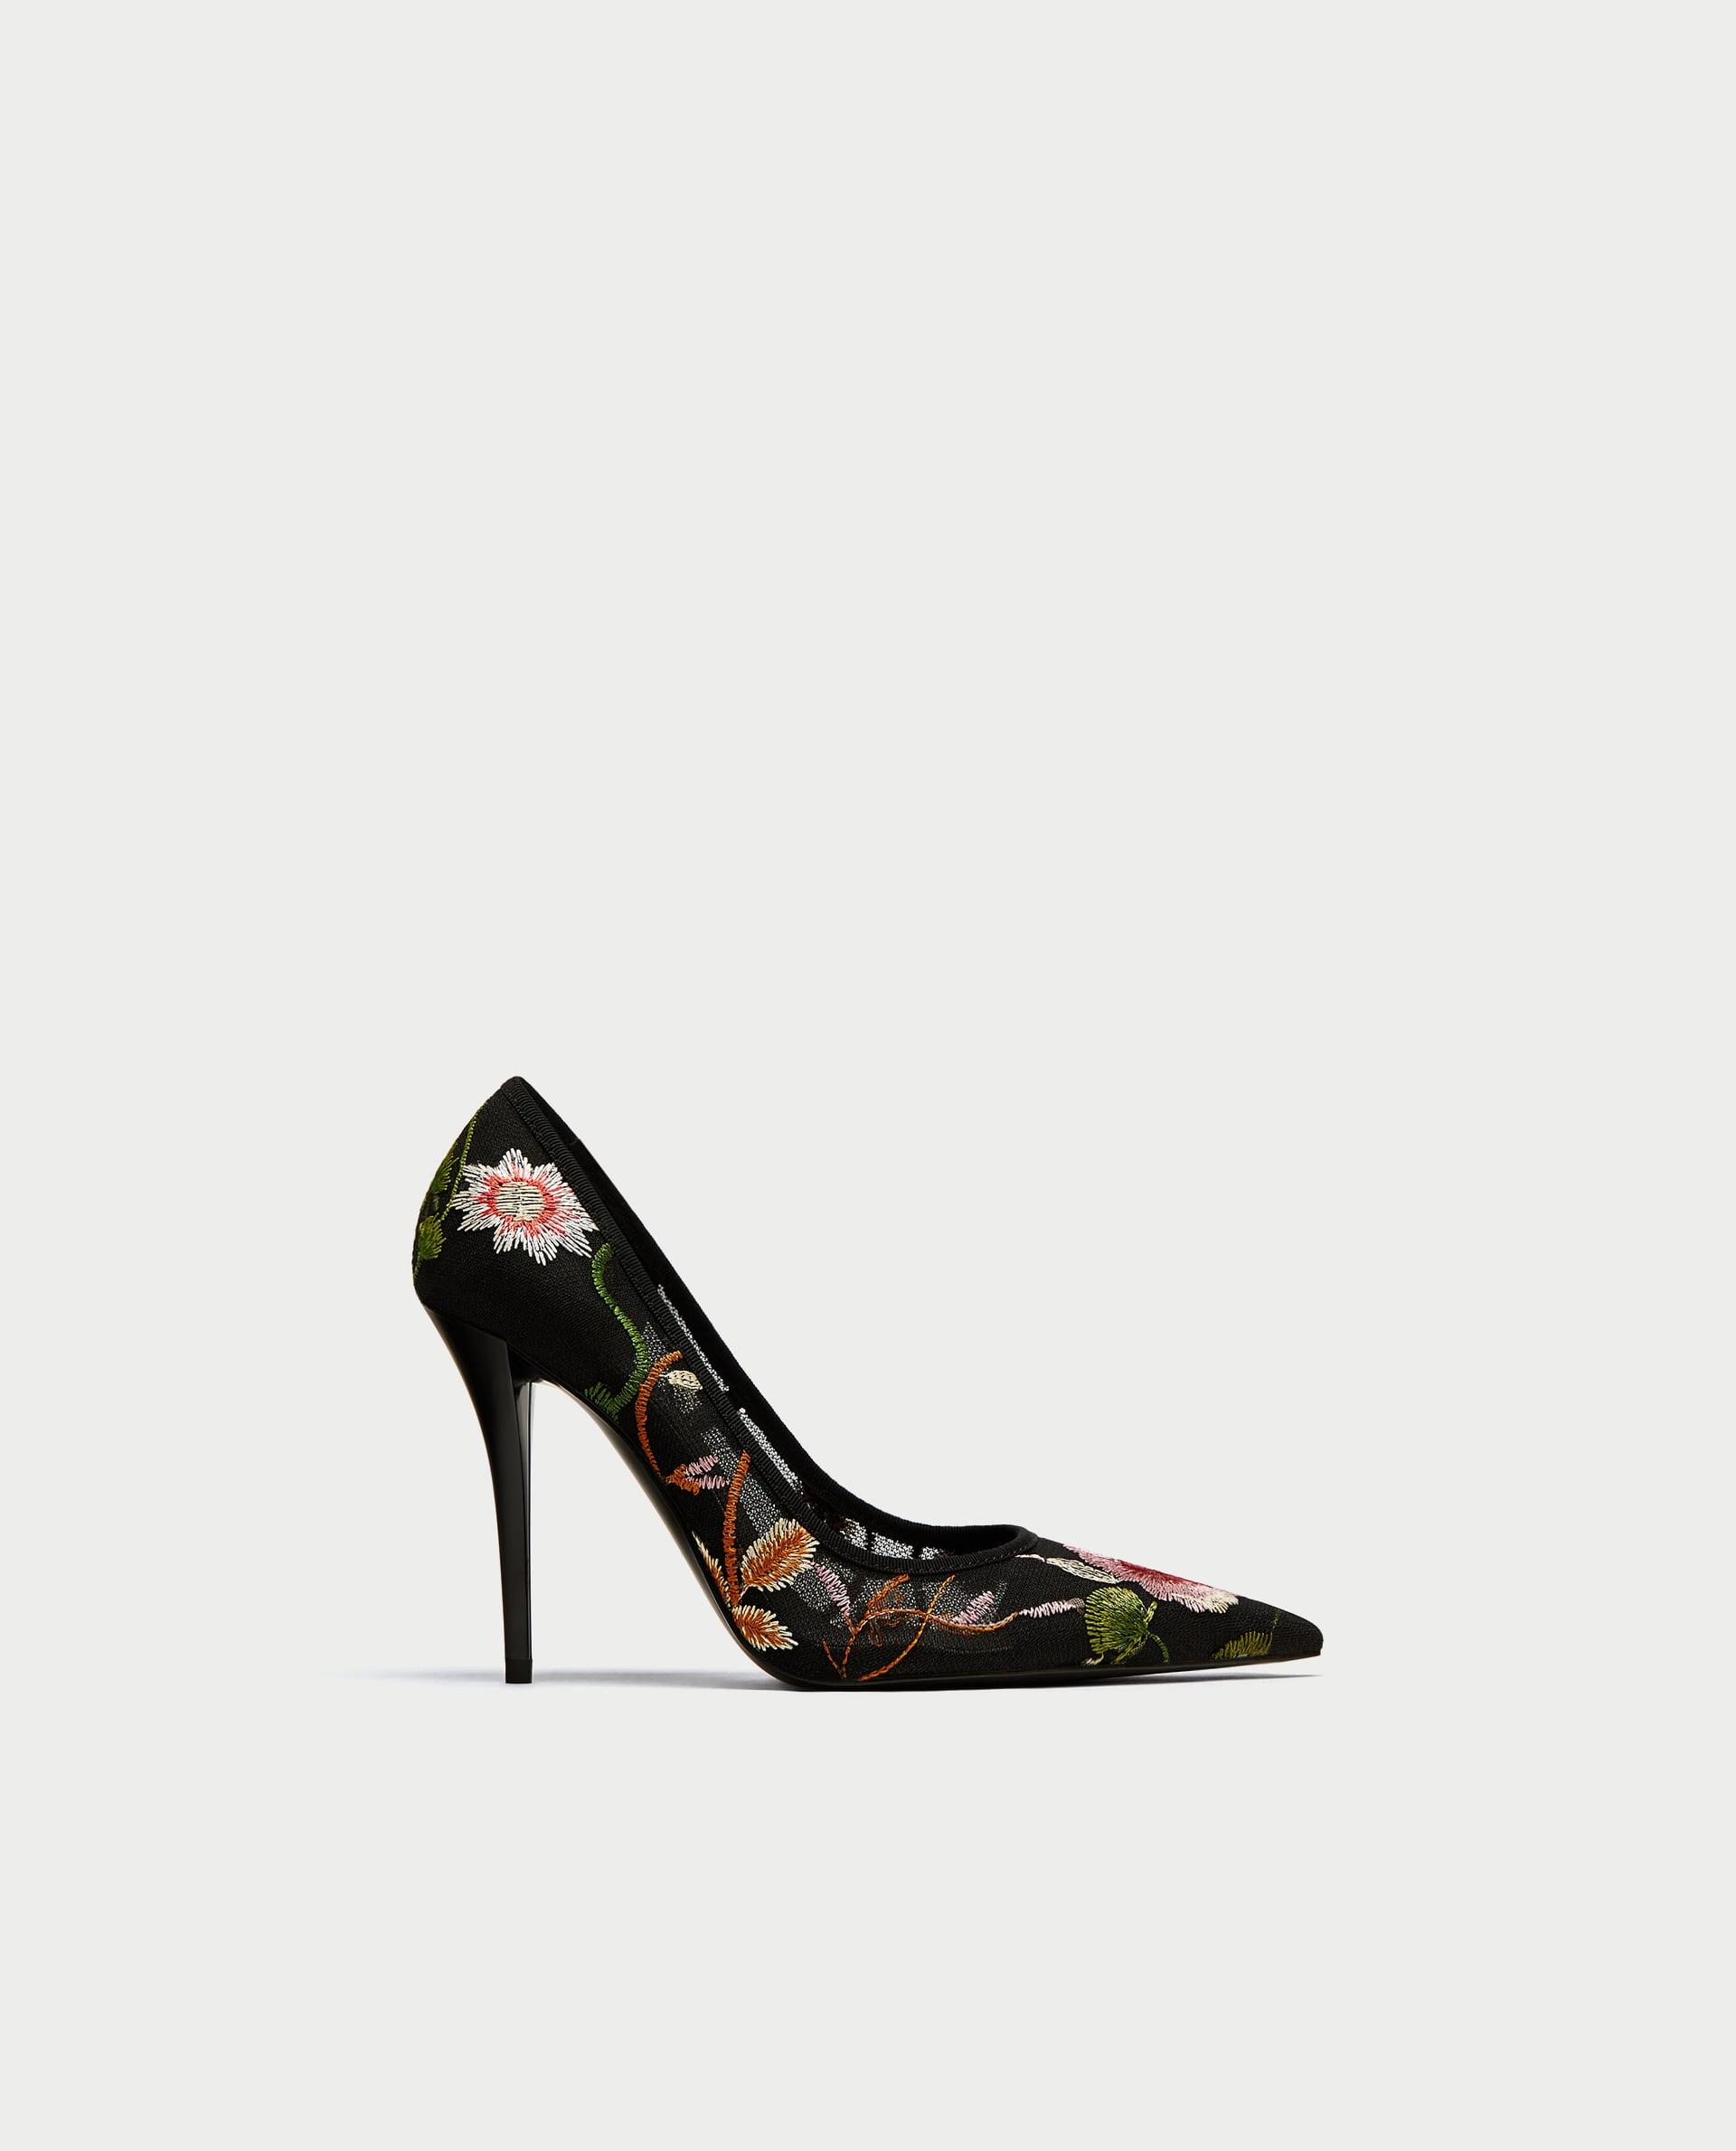 scarpe zara - Shoeplay Fashion blog di scarpe da donna 585ff42e0df